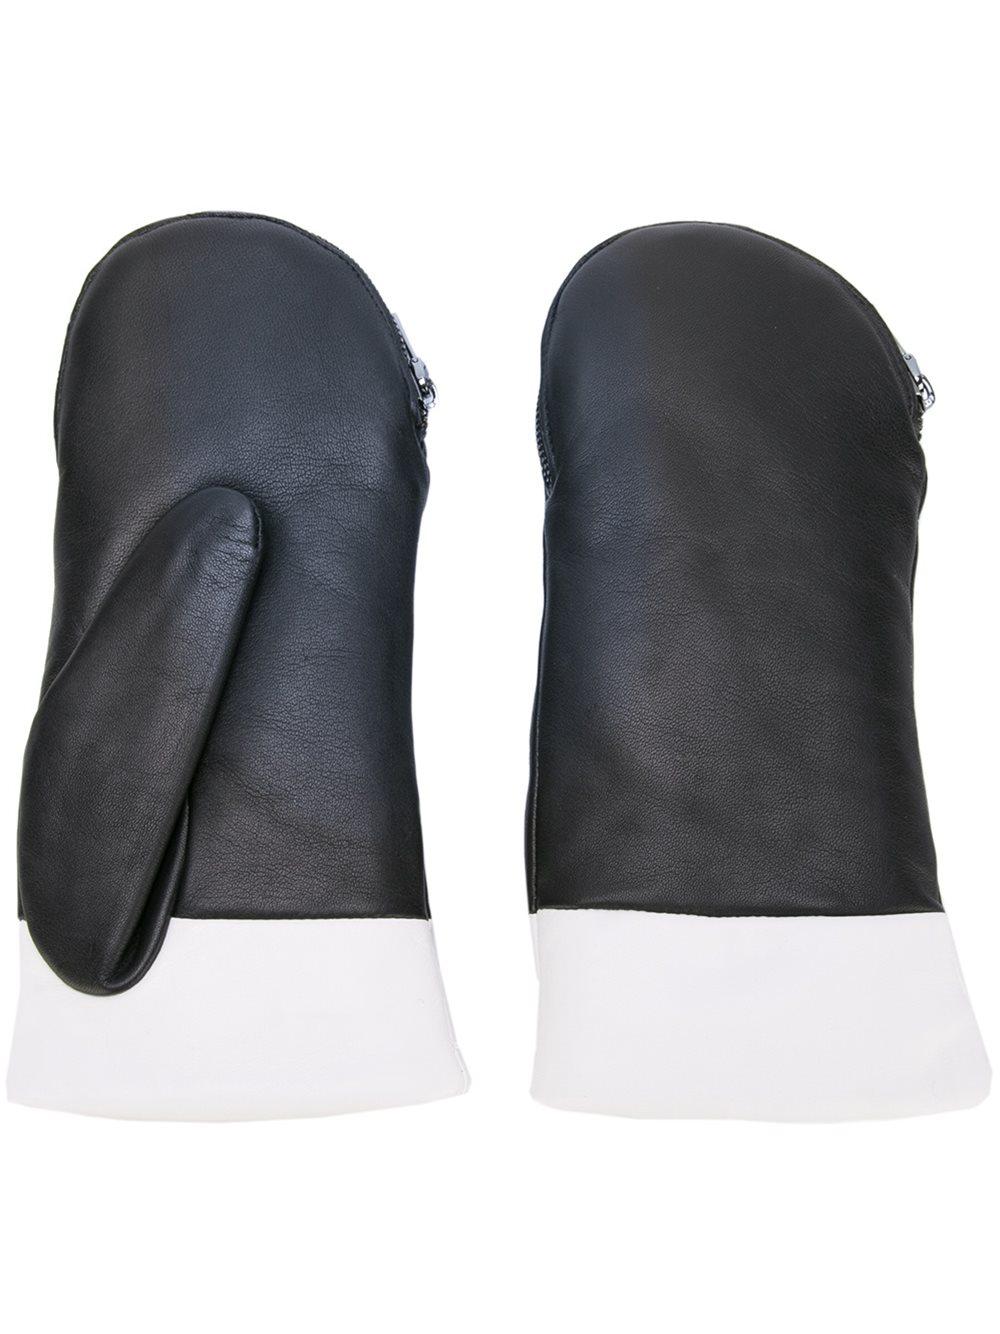 d46f1a0e0e81 Kenzo zipped mitts Homme Accessories,kenzo pas cher,mode pas chere,Kenzo-